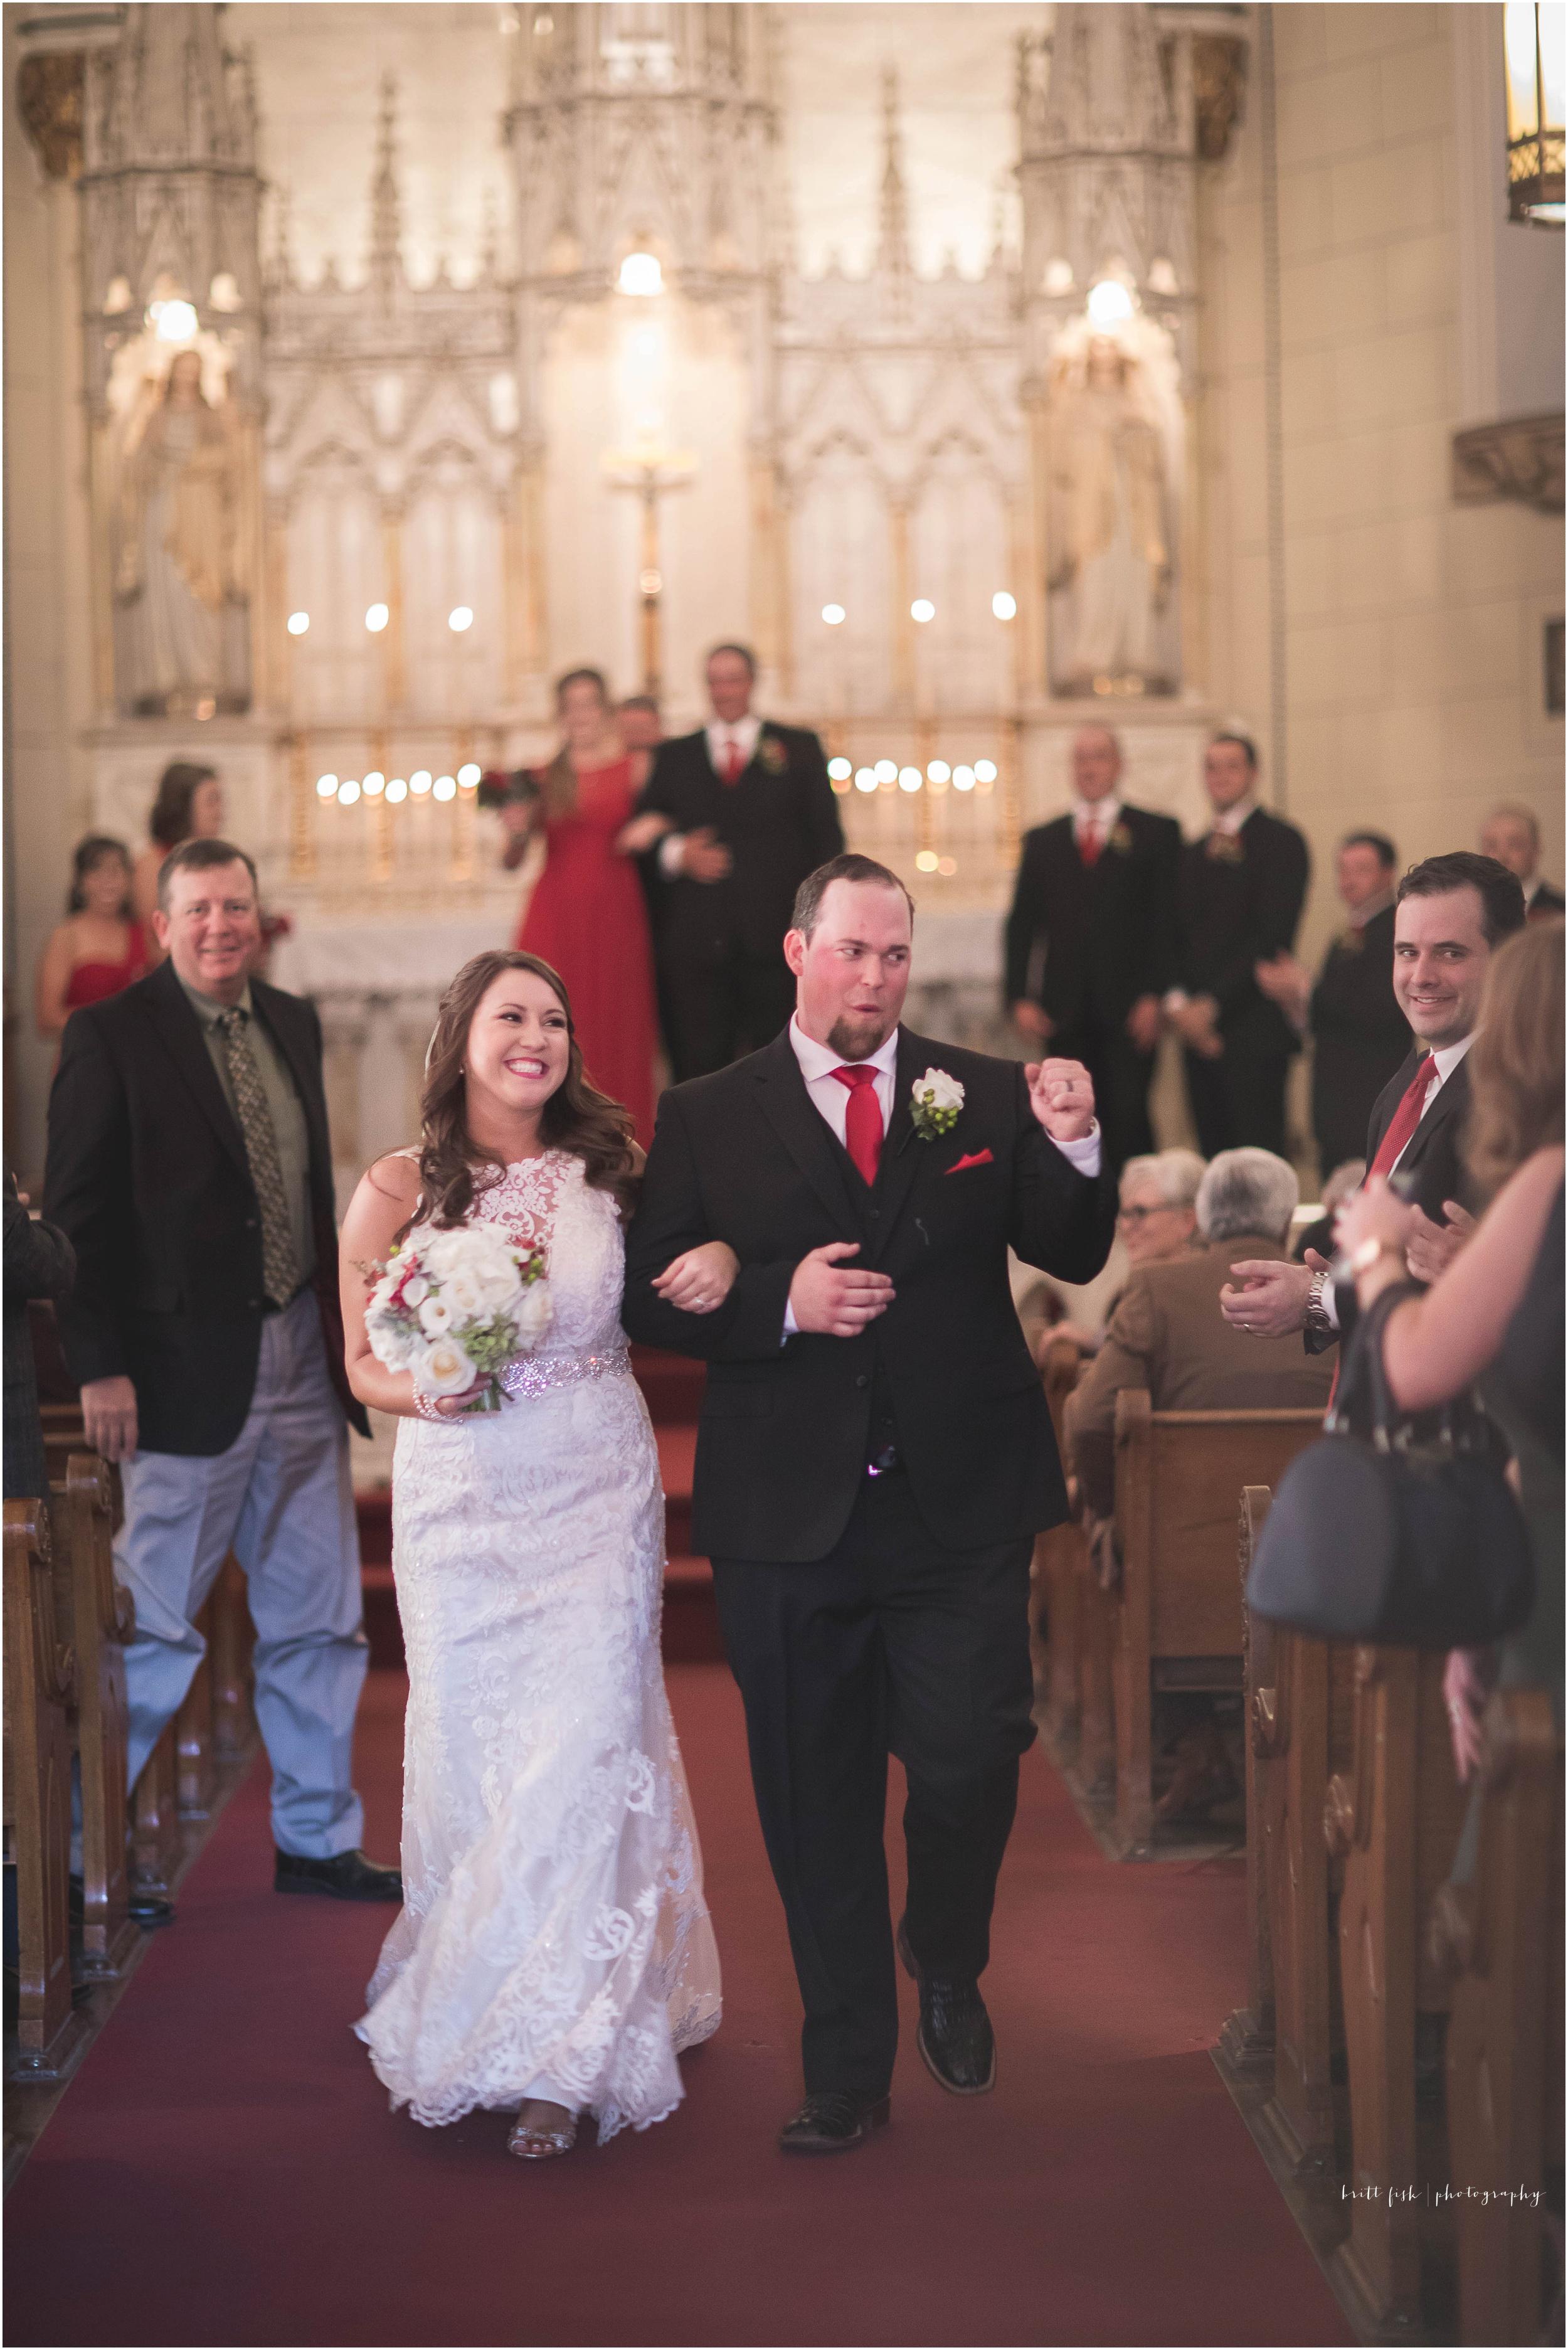 Wedding - Wood - Santa Fe, NM_0023.jpg